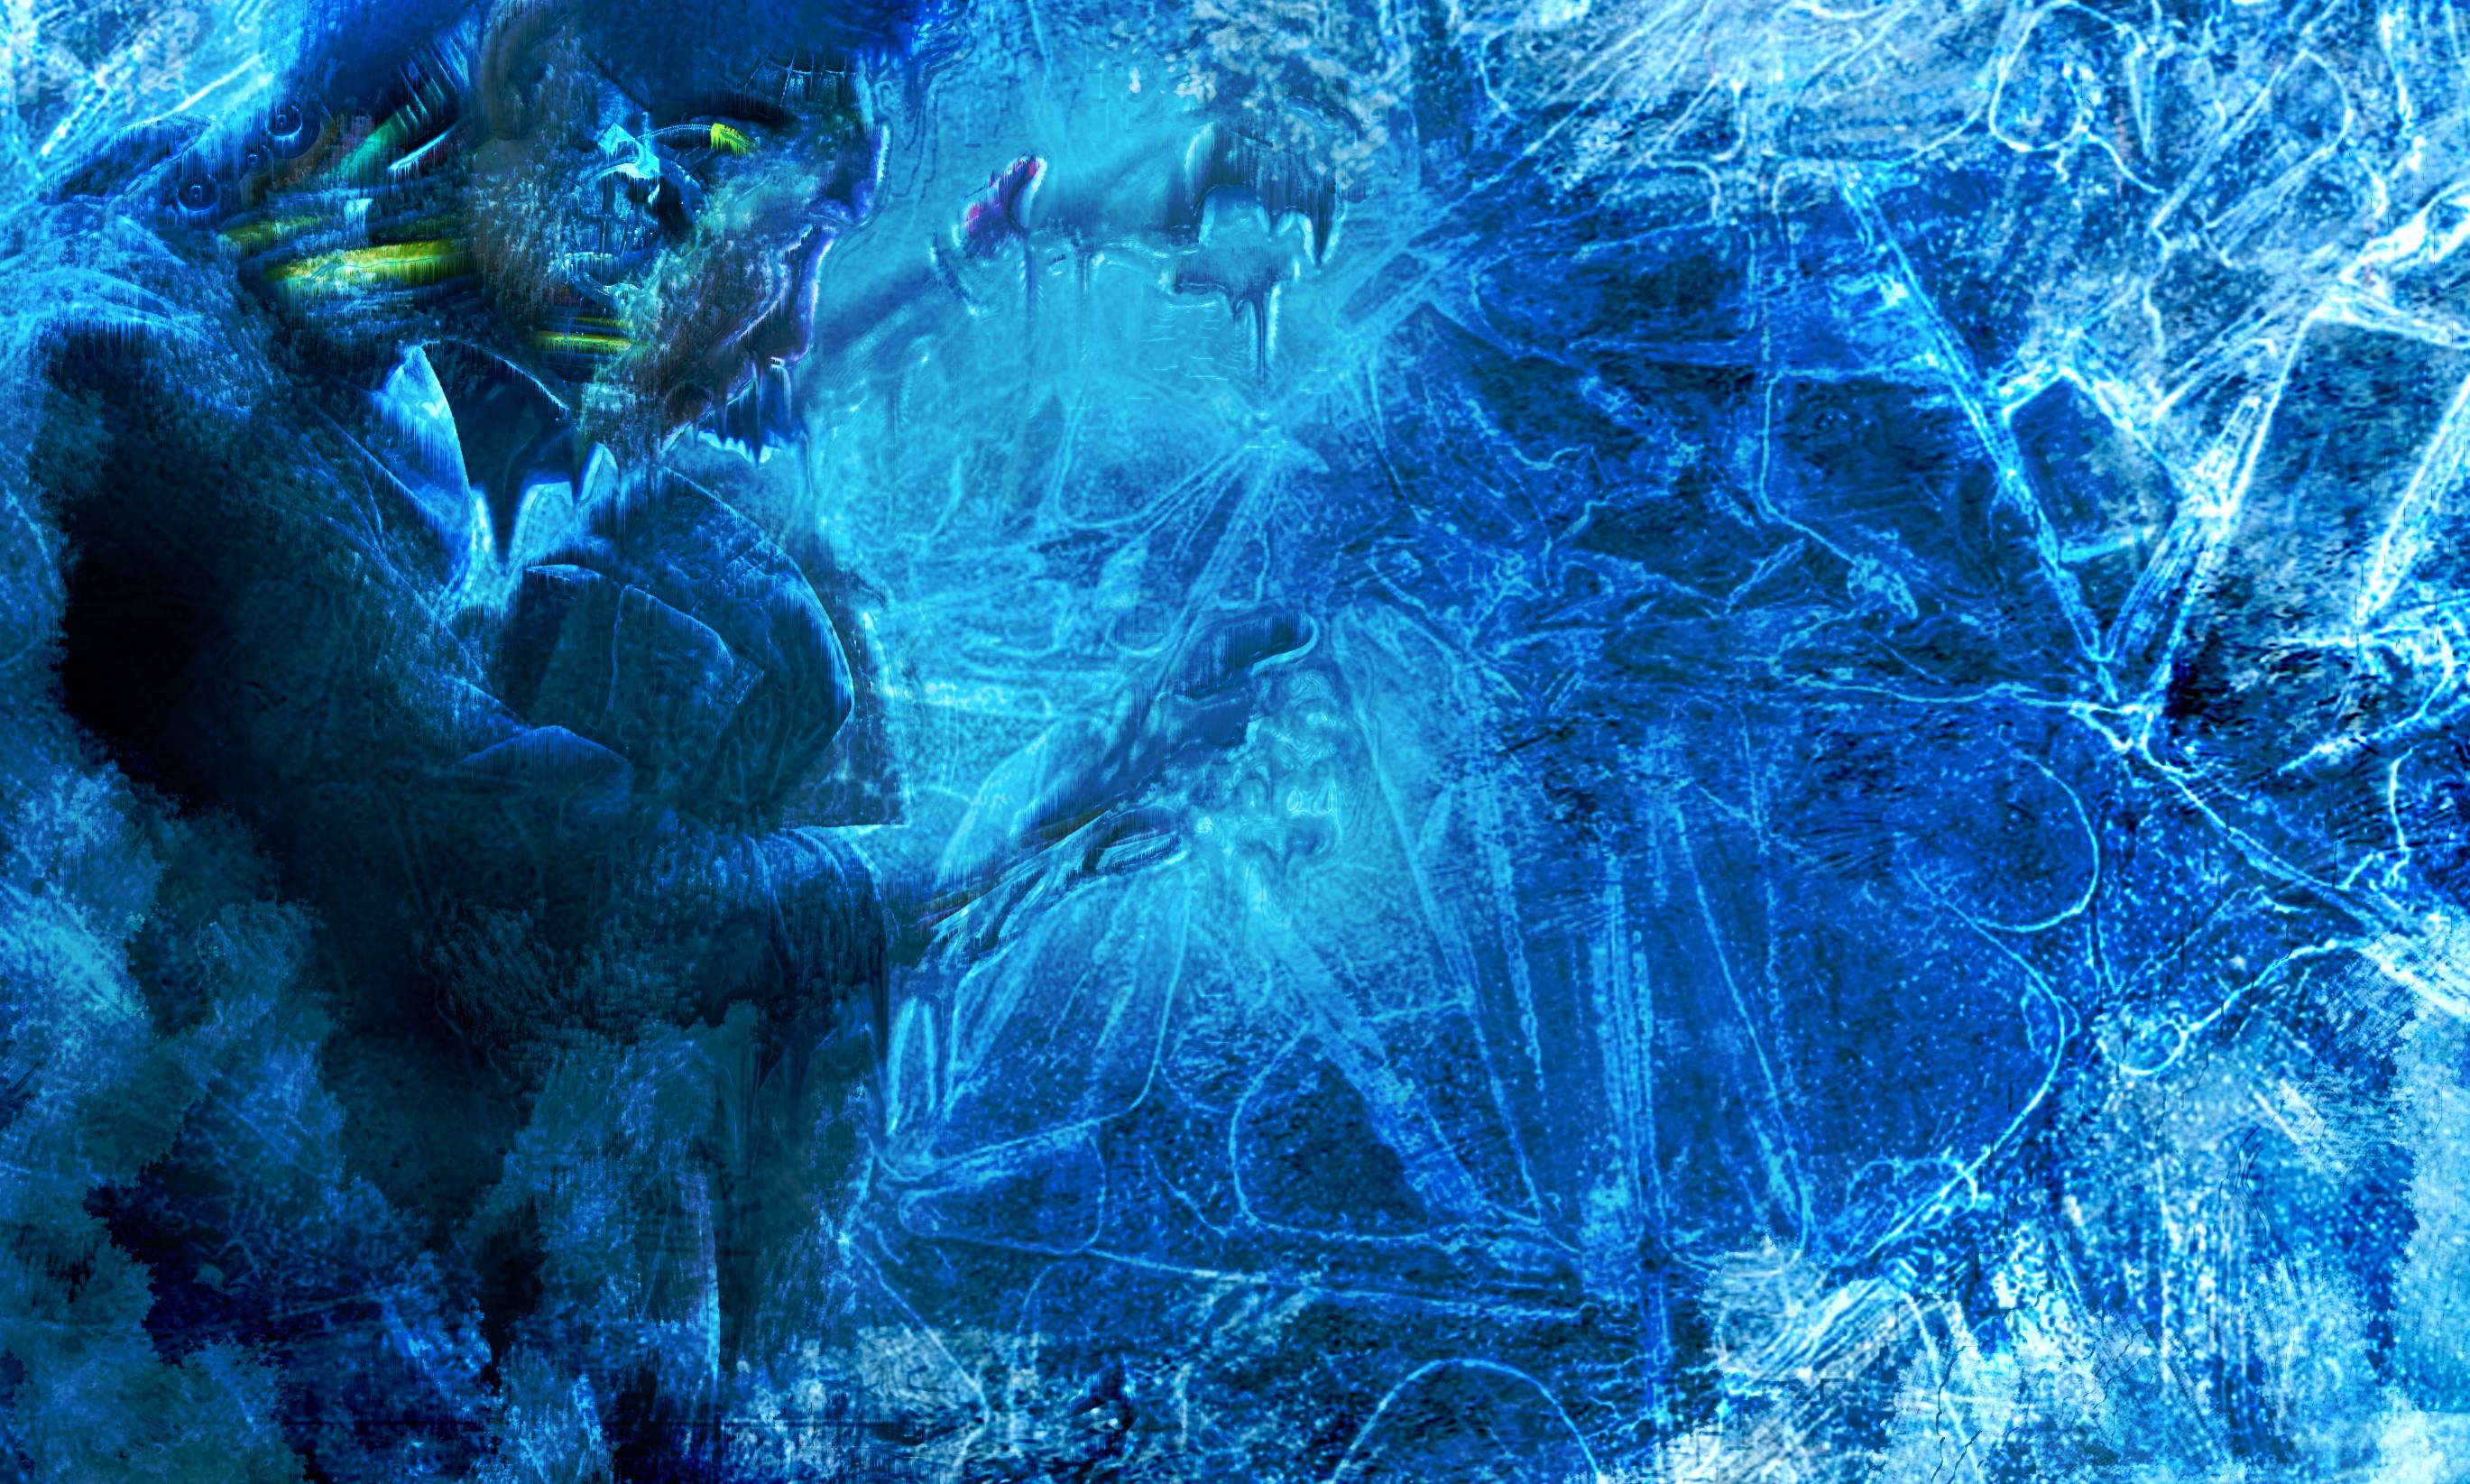 frozen cyborg by irfansisi 2738x1645